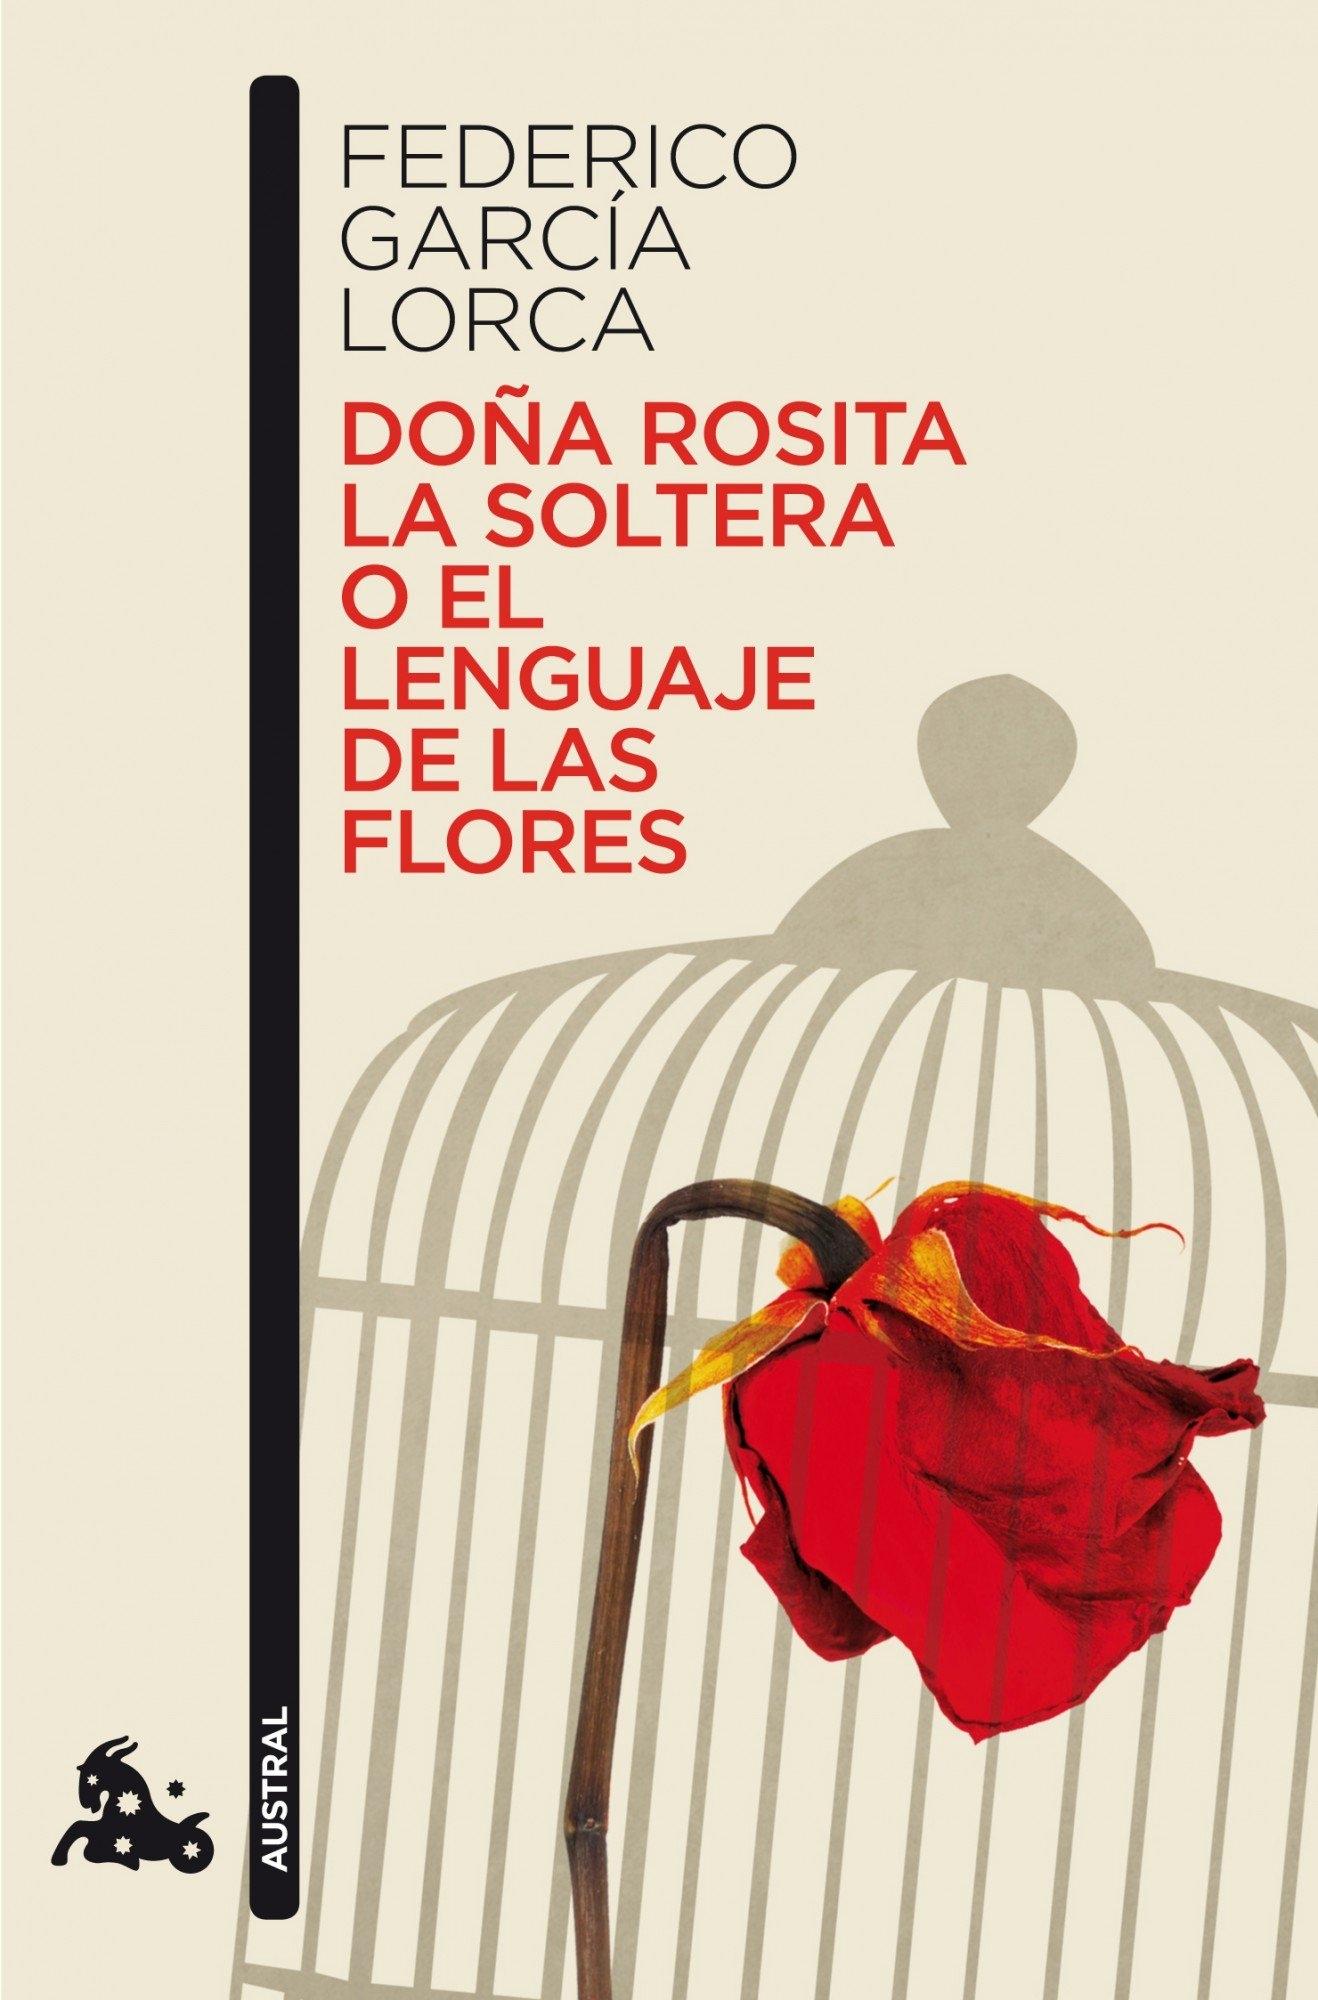 Doúa Rosita la Soltera..nê 197*11*austra